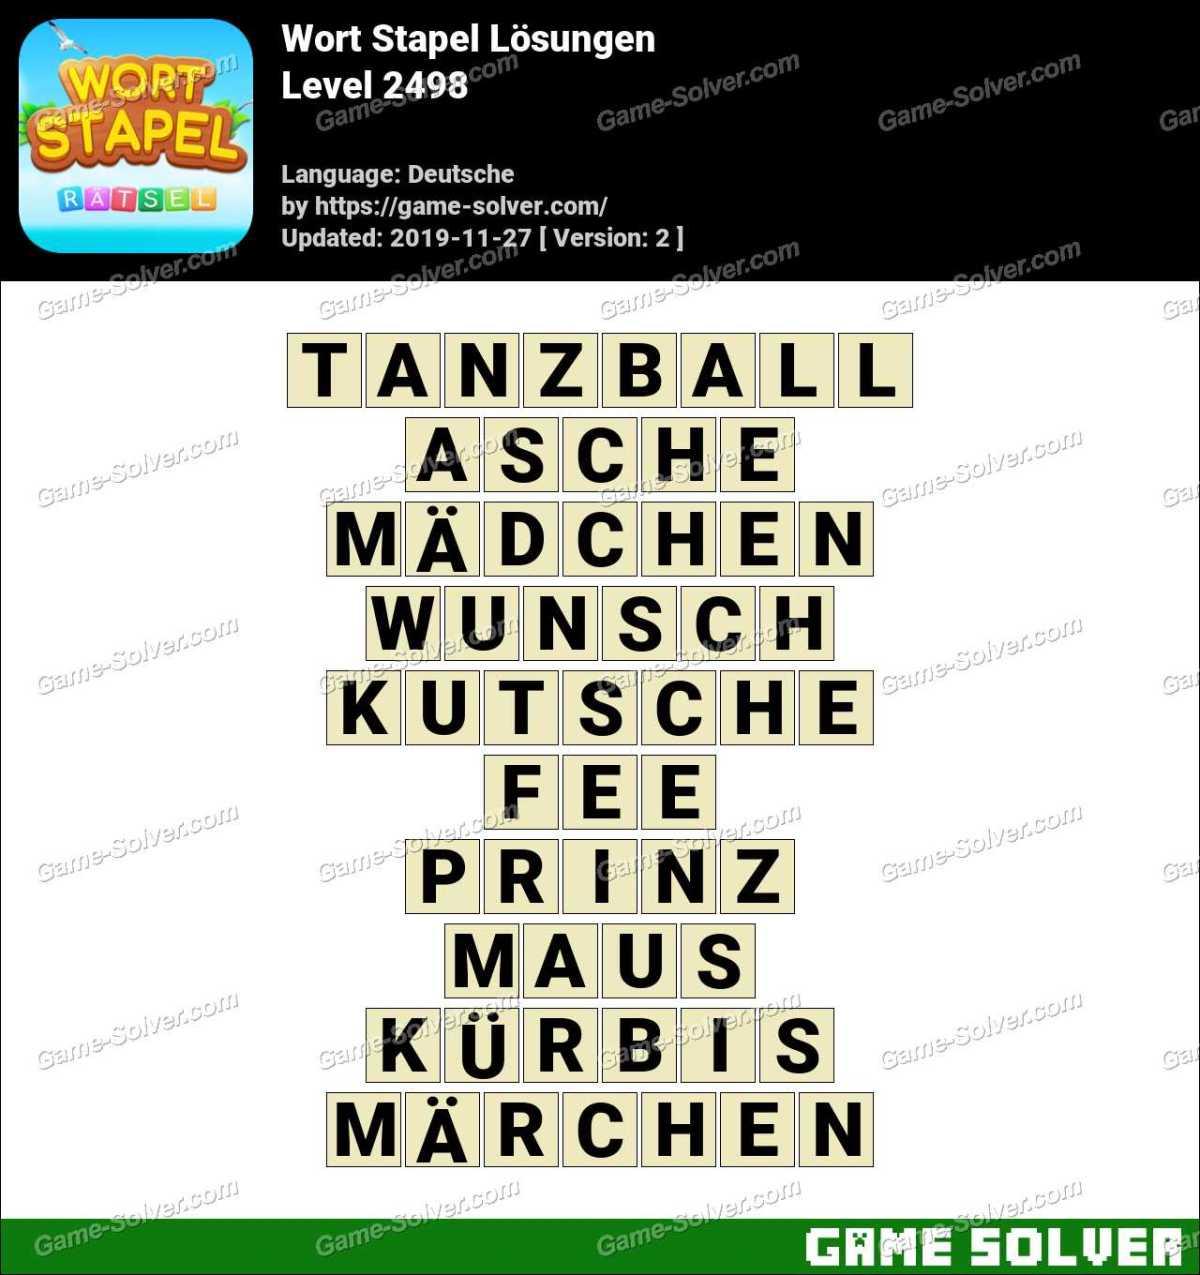 Wort Stapel Level 2498 Lösungen